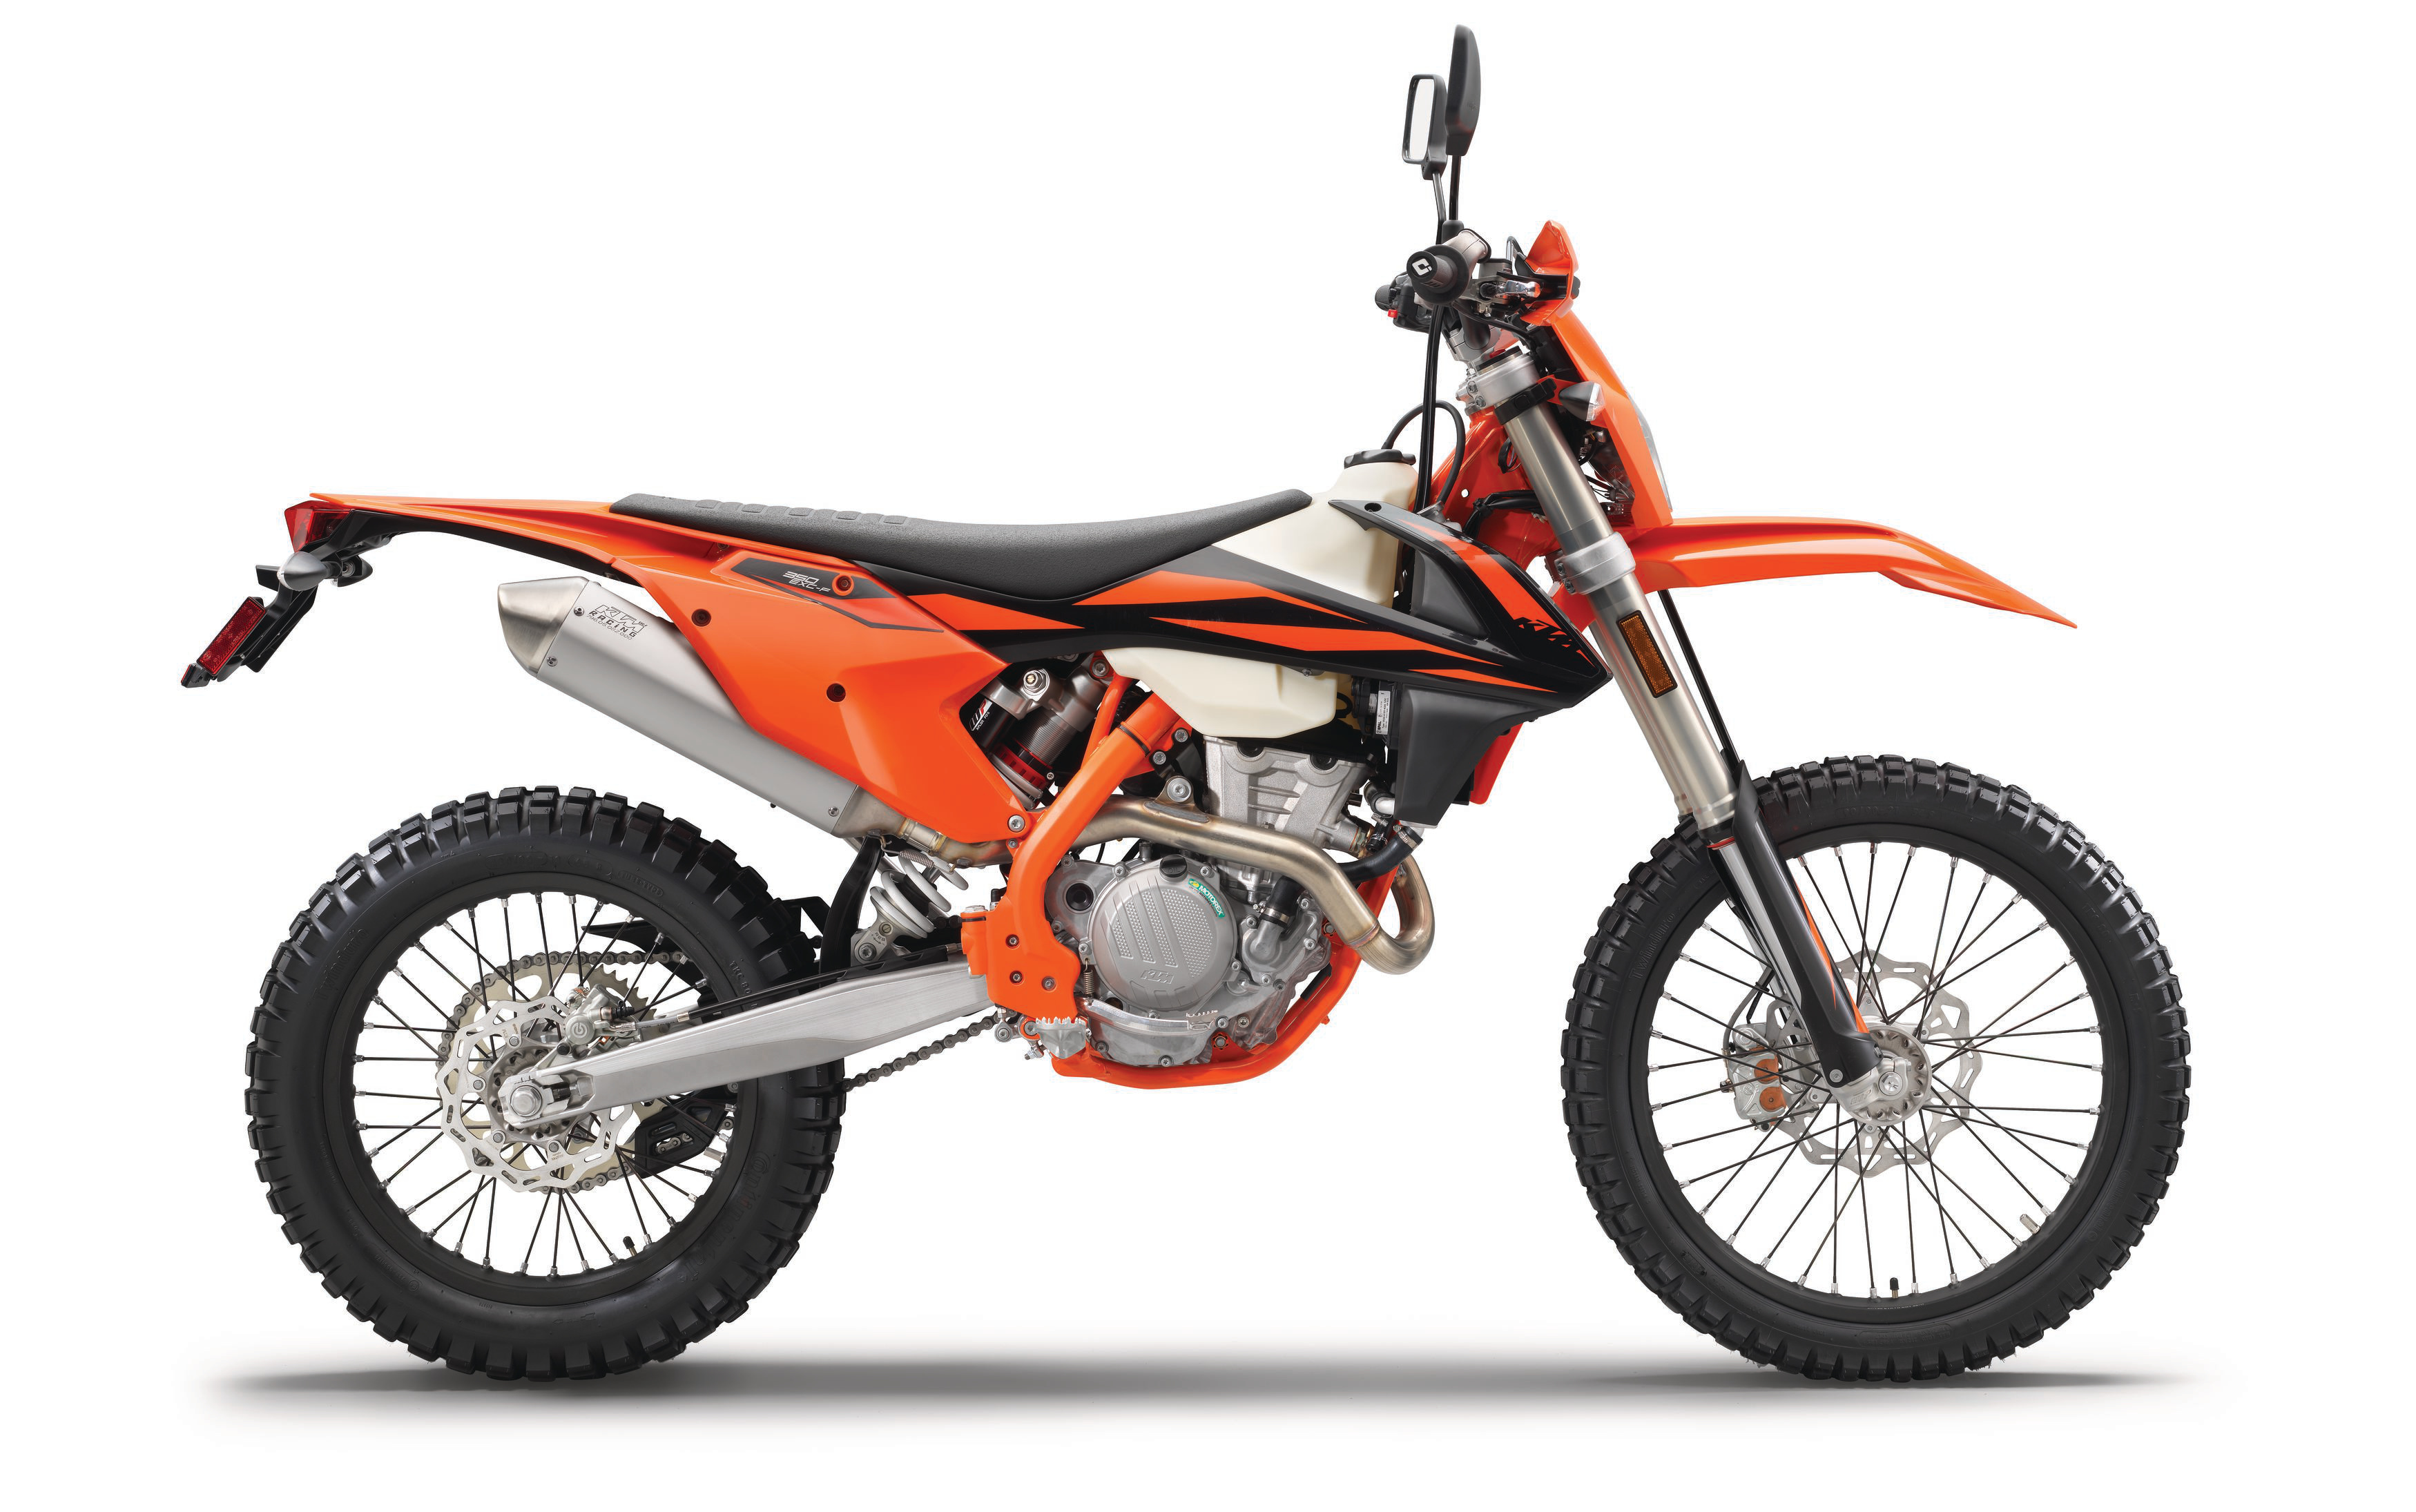 350 EXCF